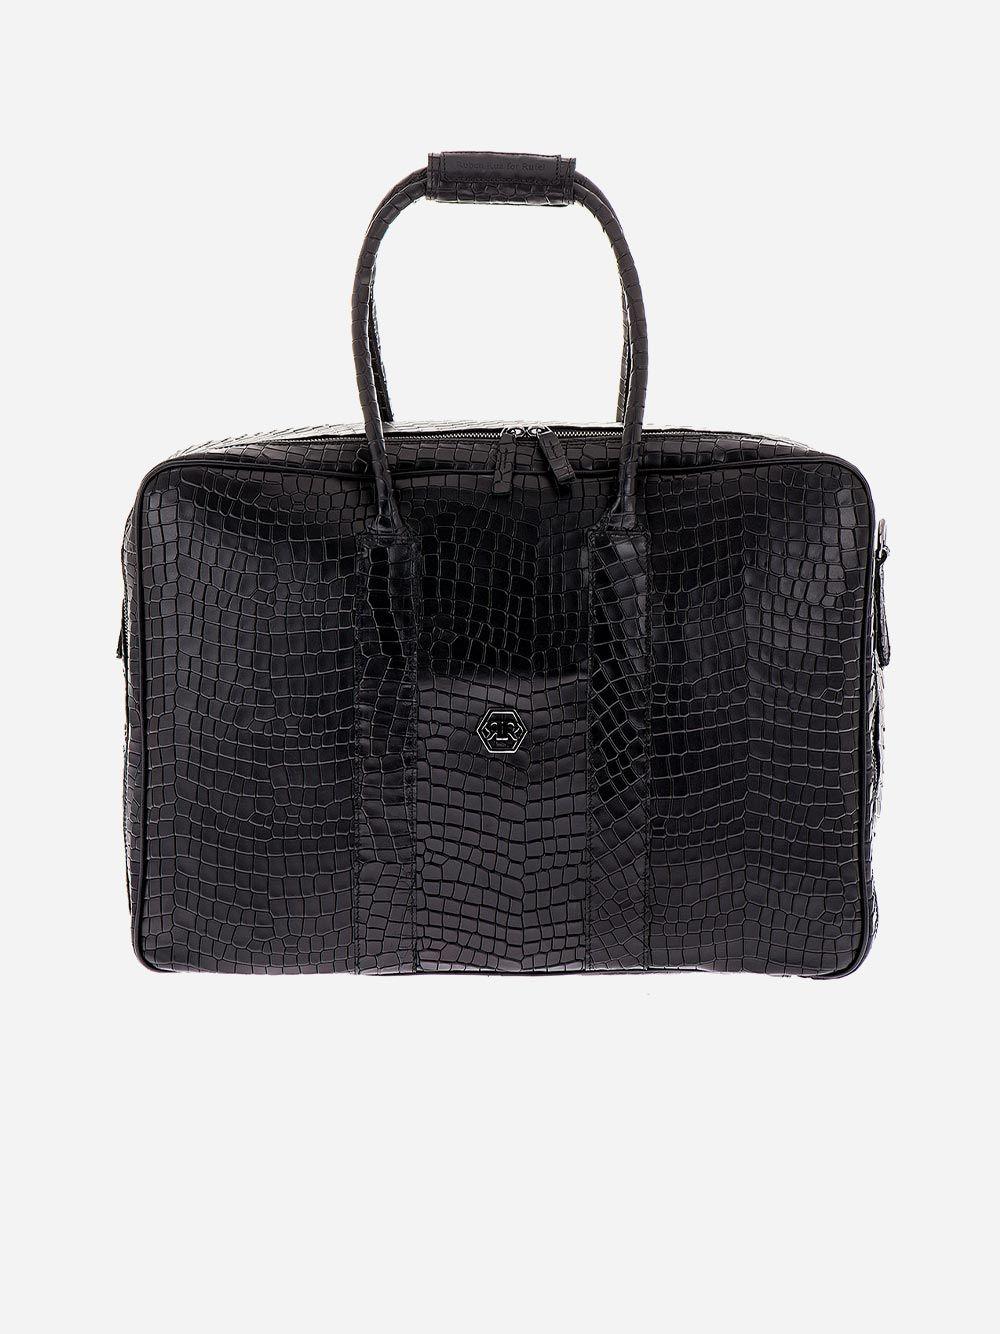 Black Croc Effect Weekend Bag | Rufel